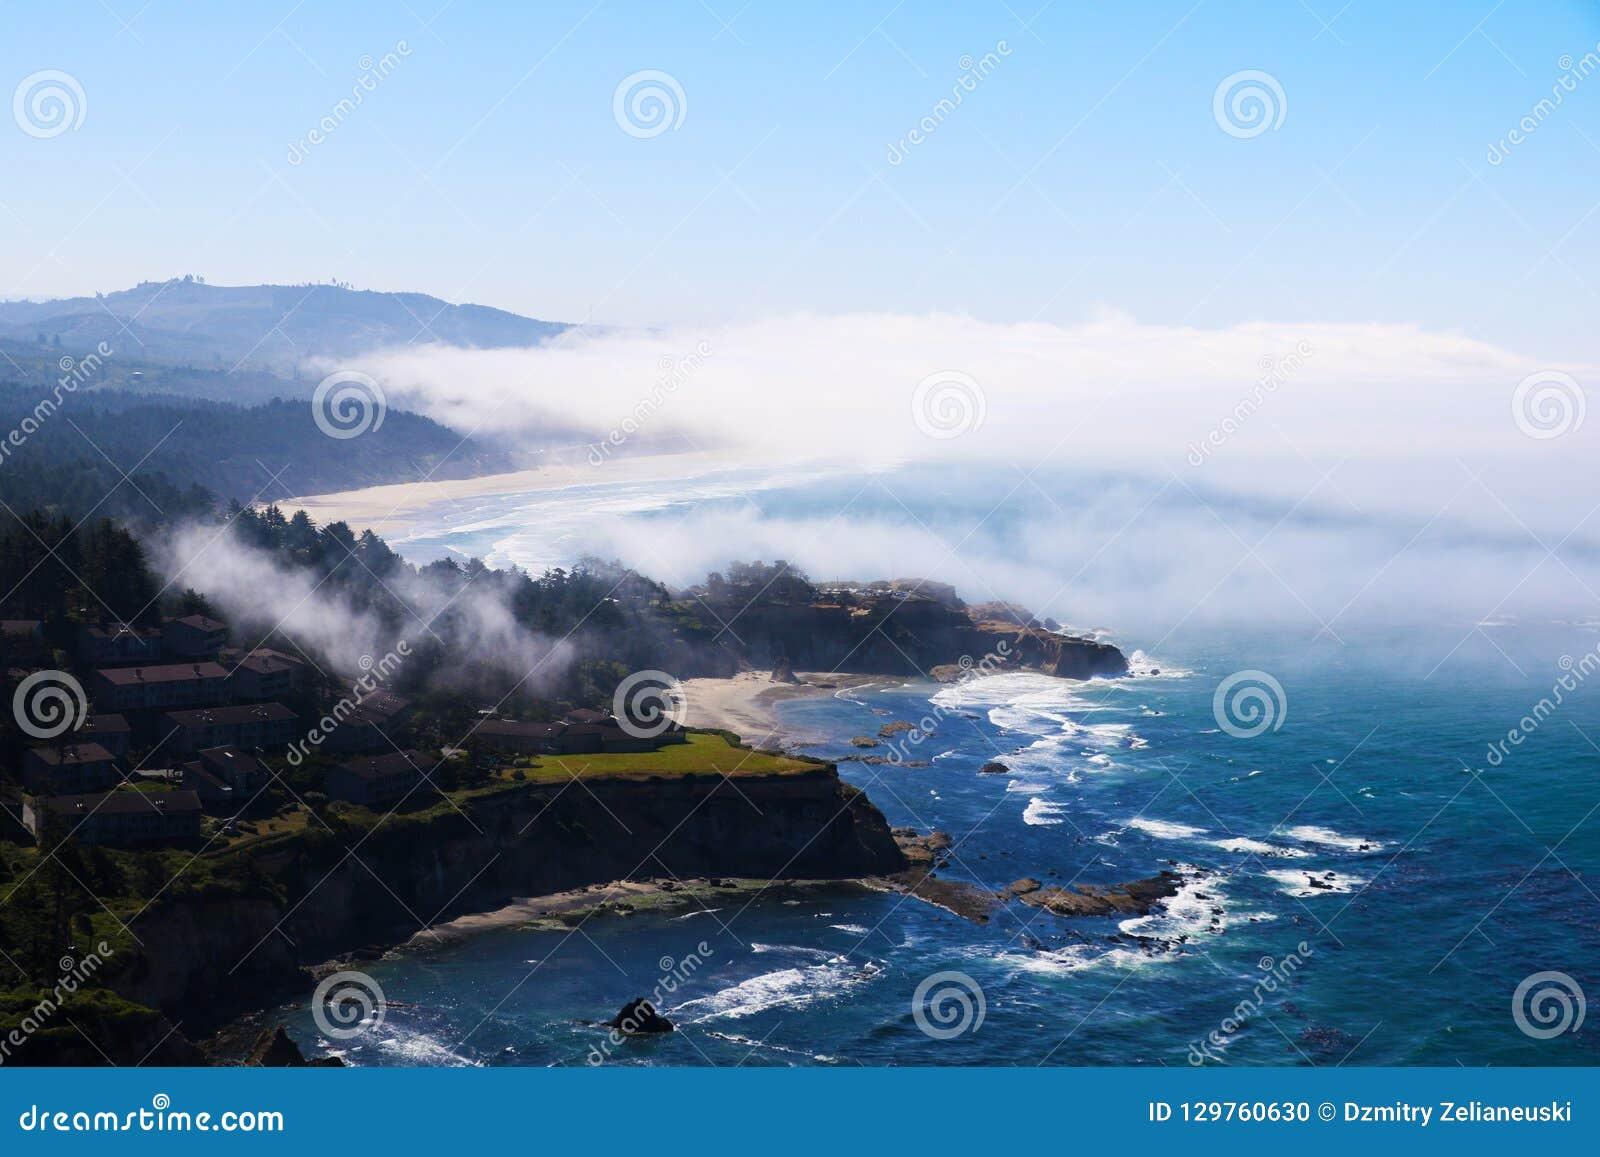 Praia no oceano, vista de cima de Oceano Pacífico, Califórnia